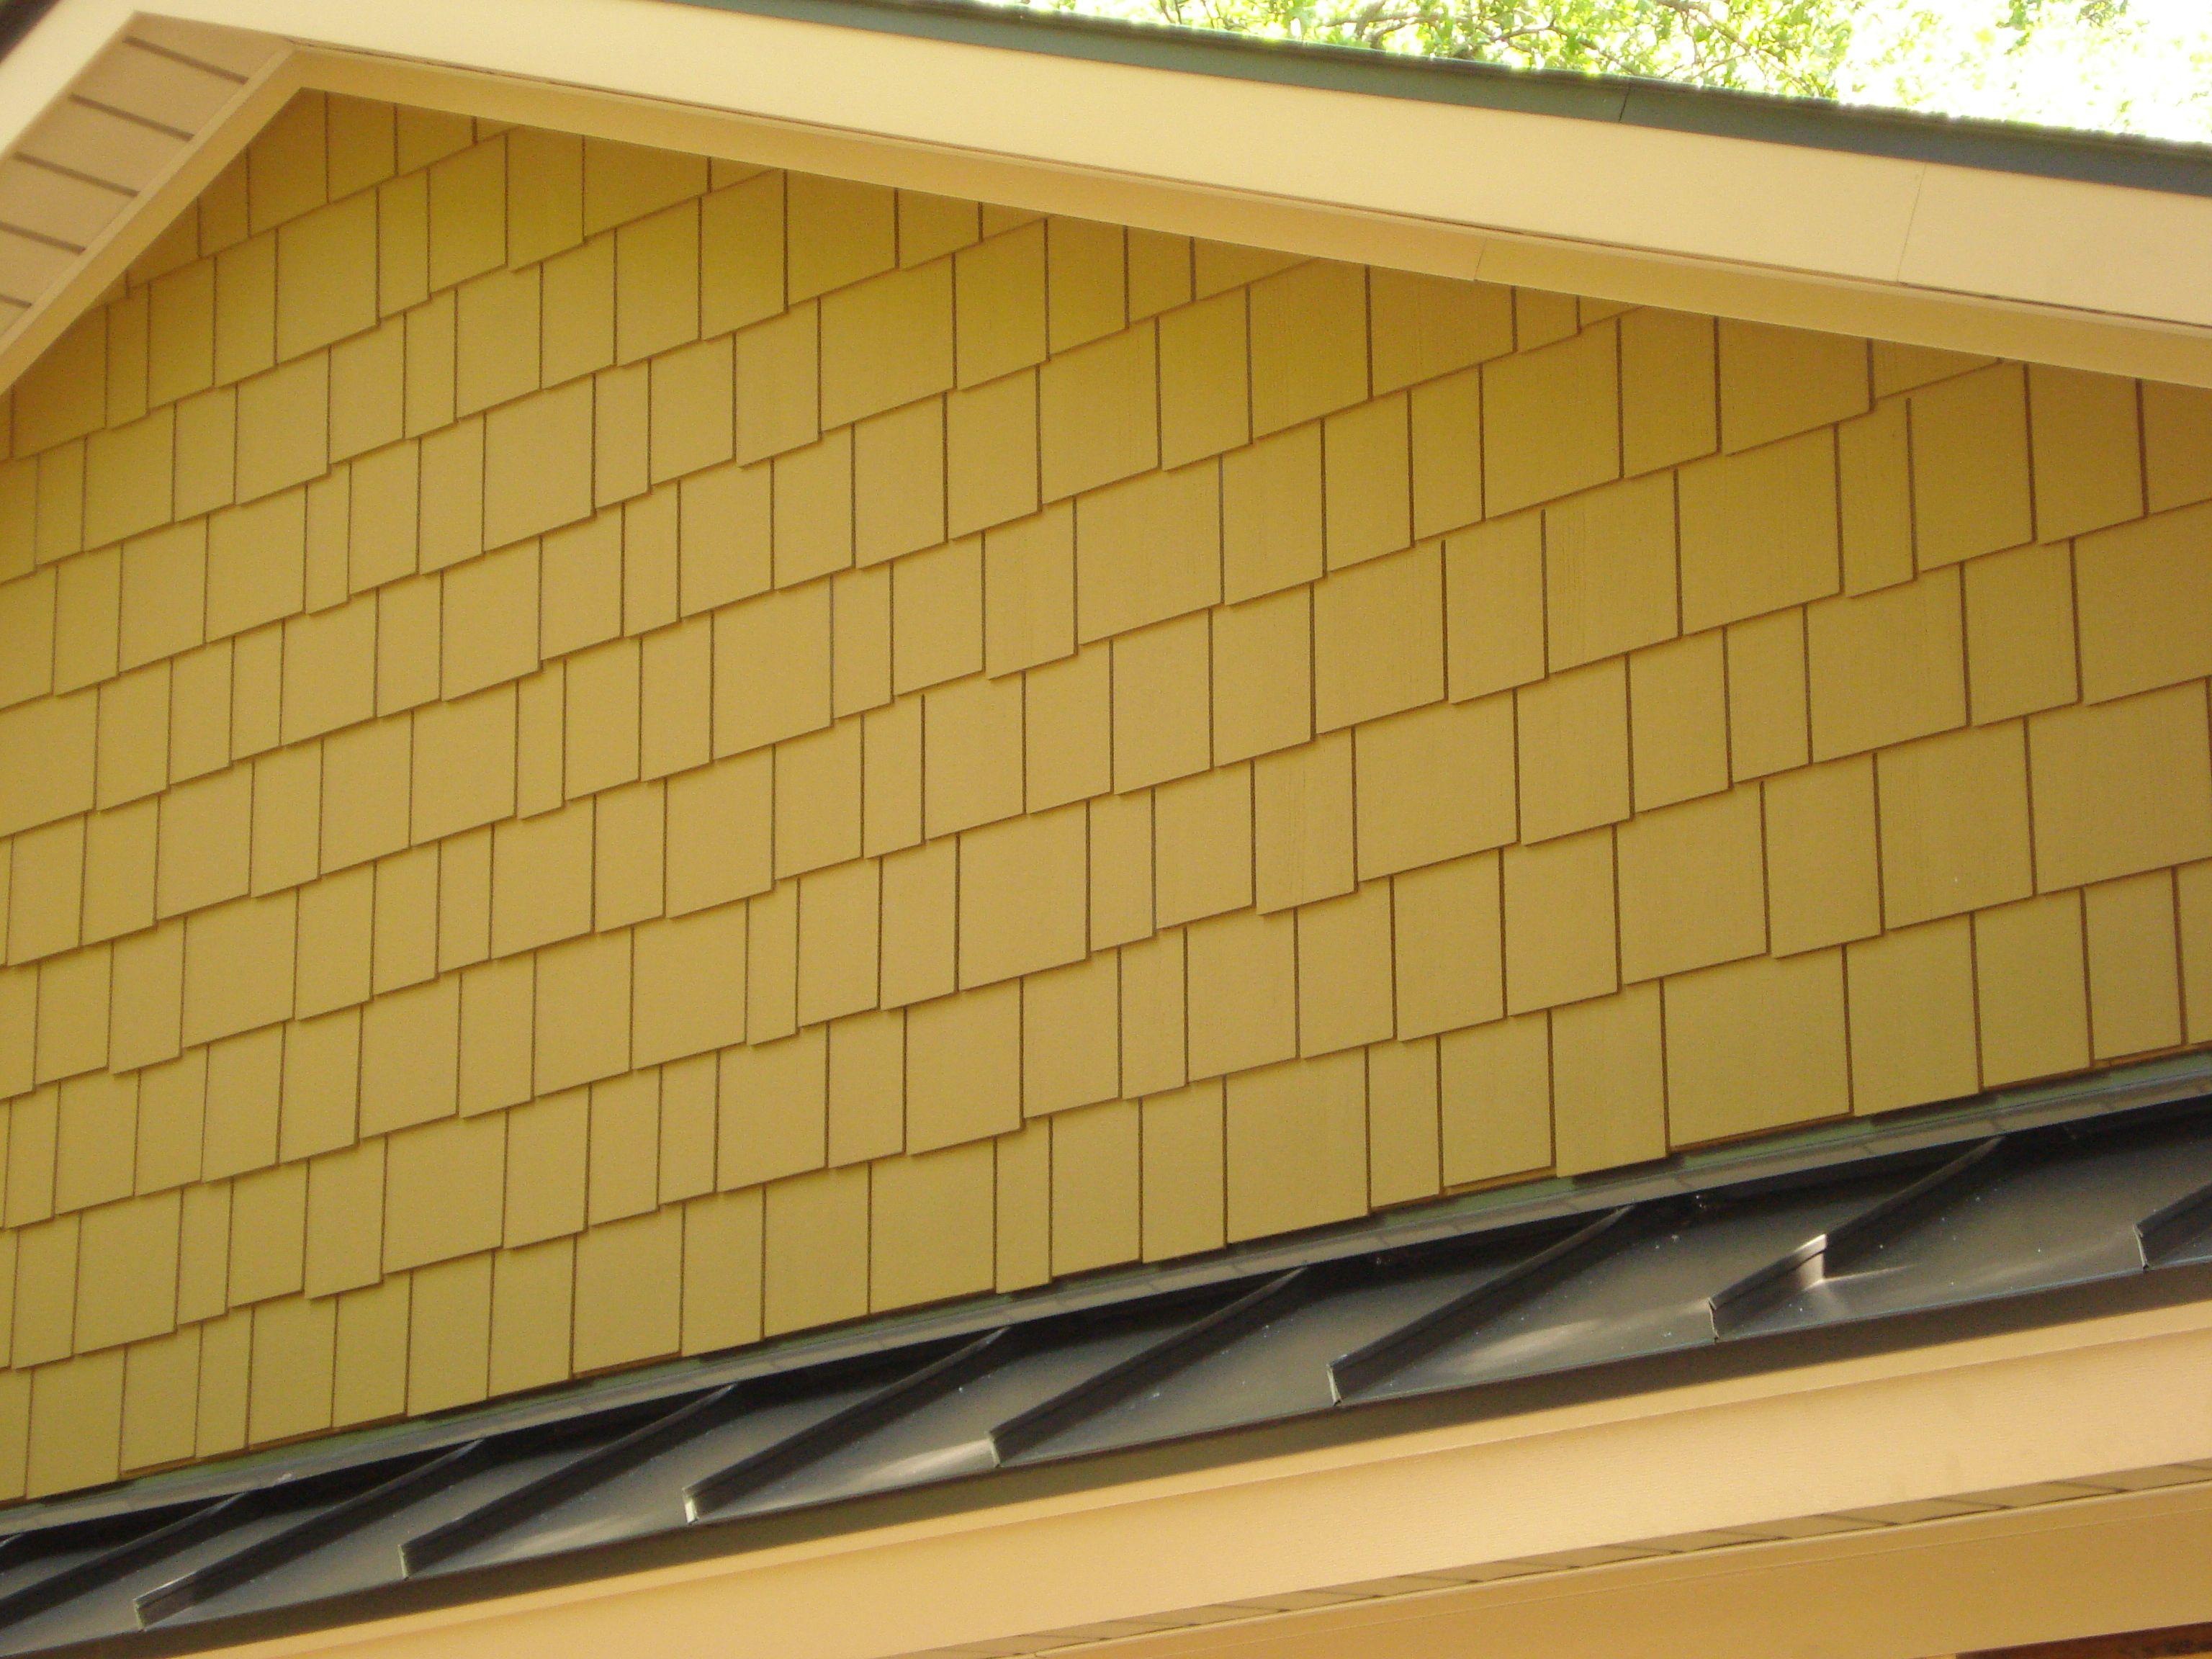 Certainteed Cement Fiber Siding System On Gable End Fiber Cement Siding Certainteed Porch Area